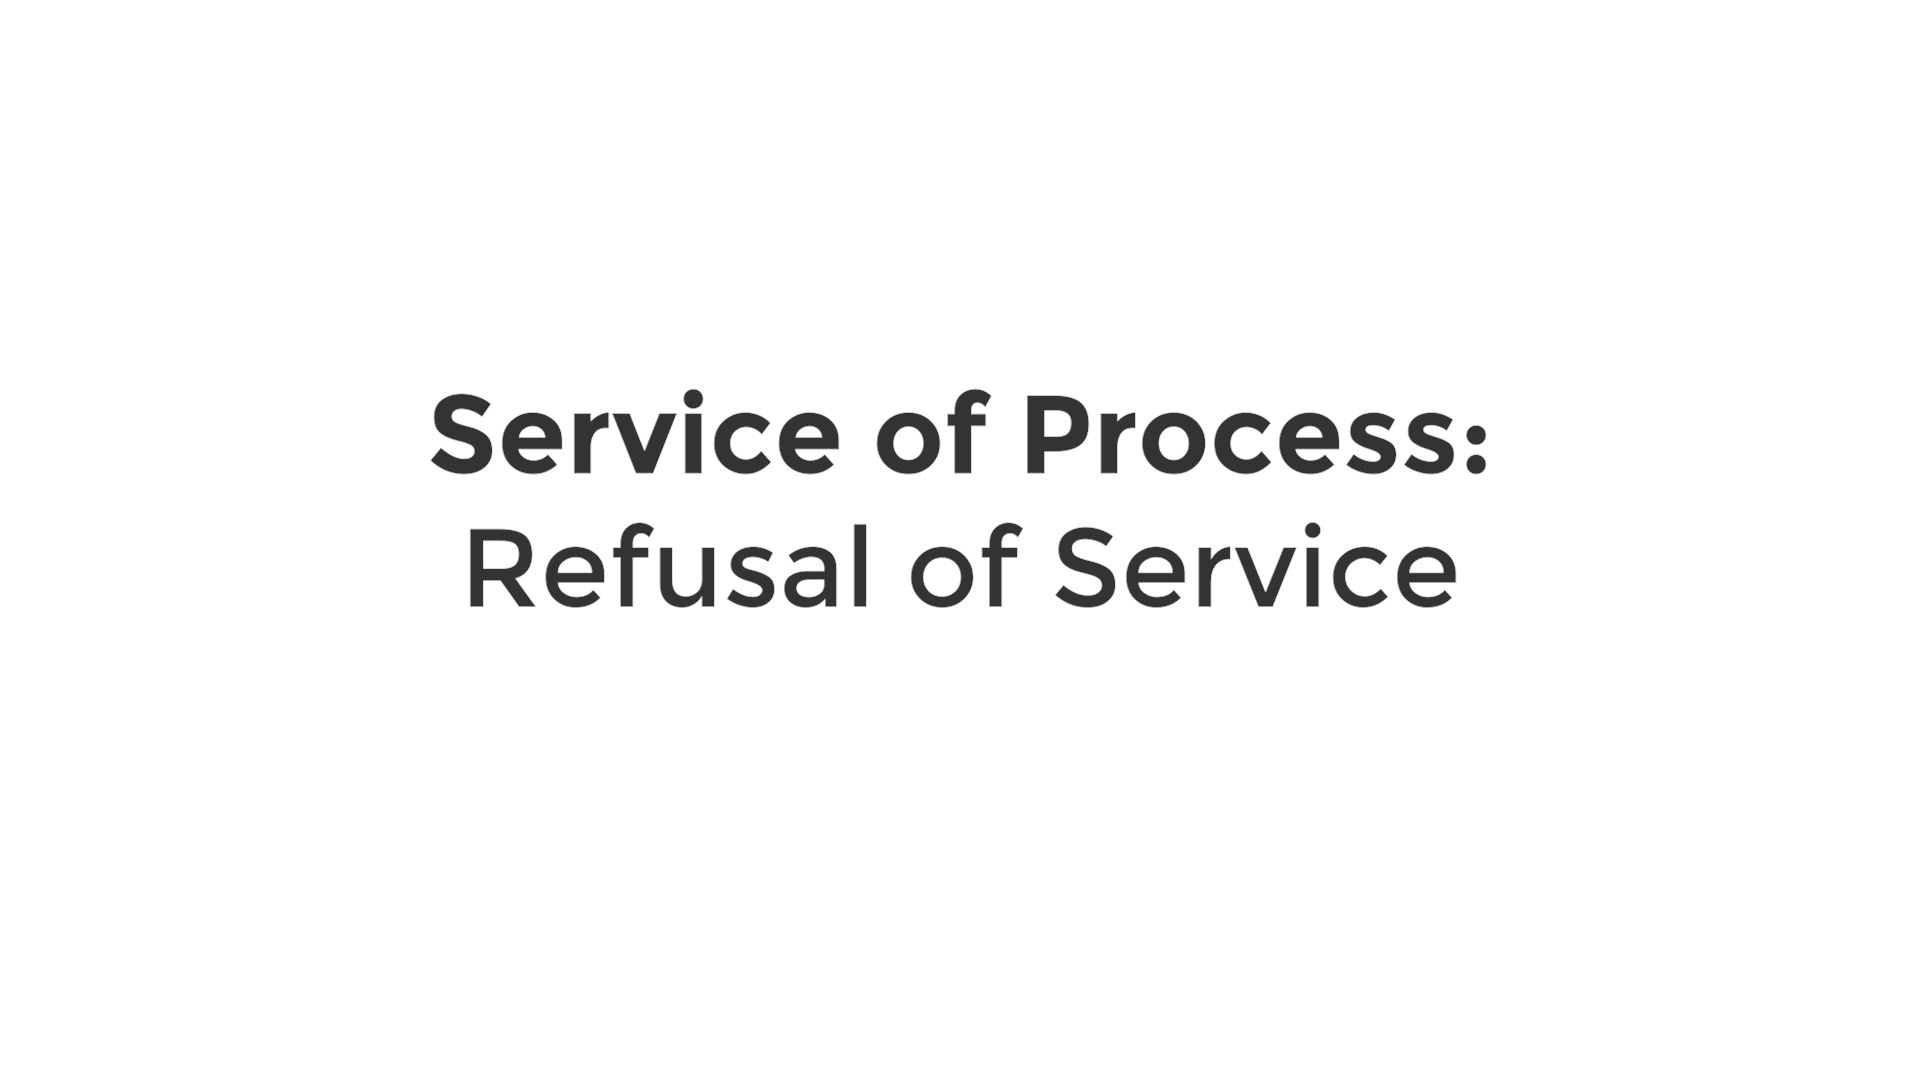 Refusal of Service